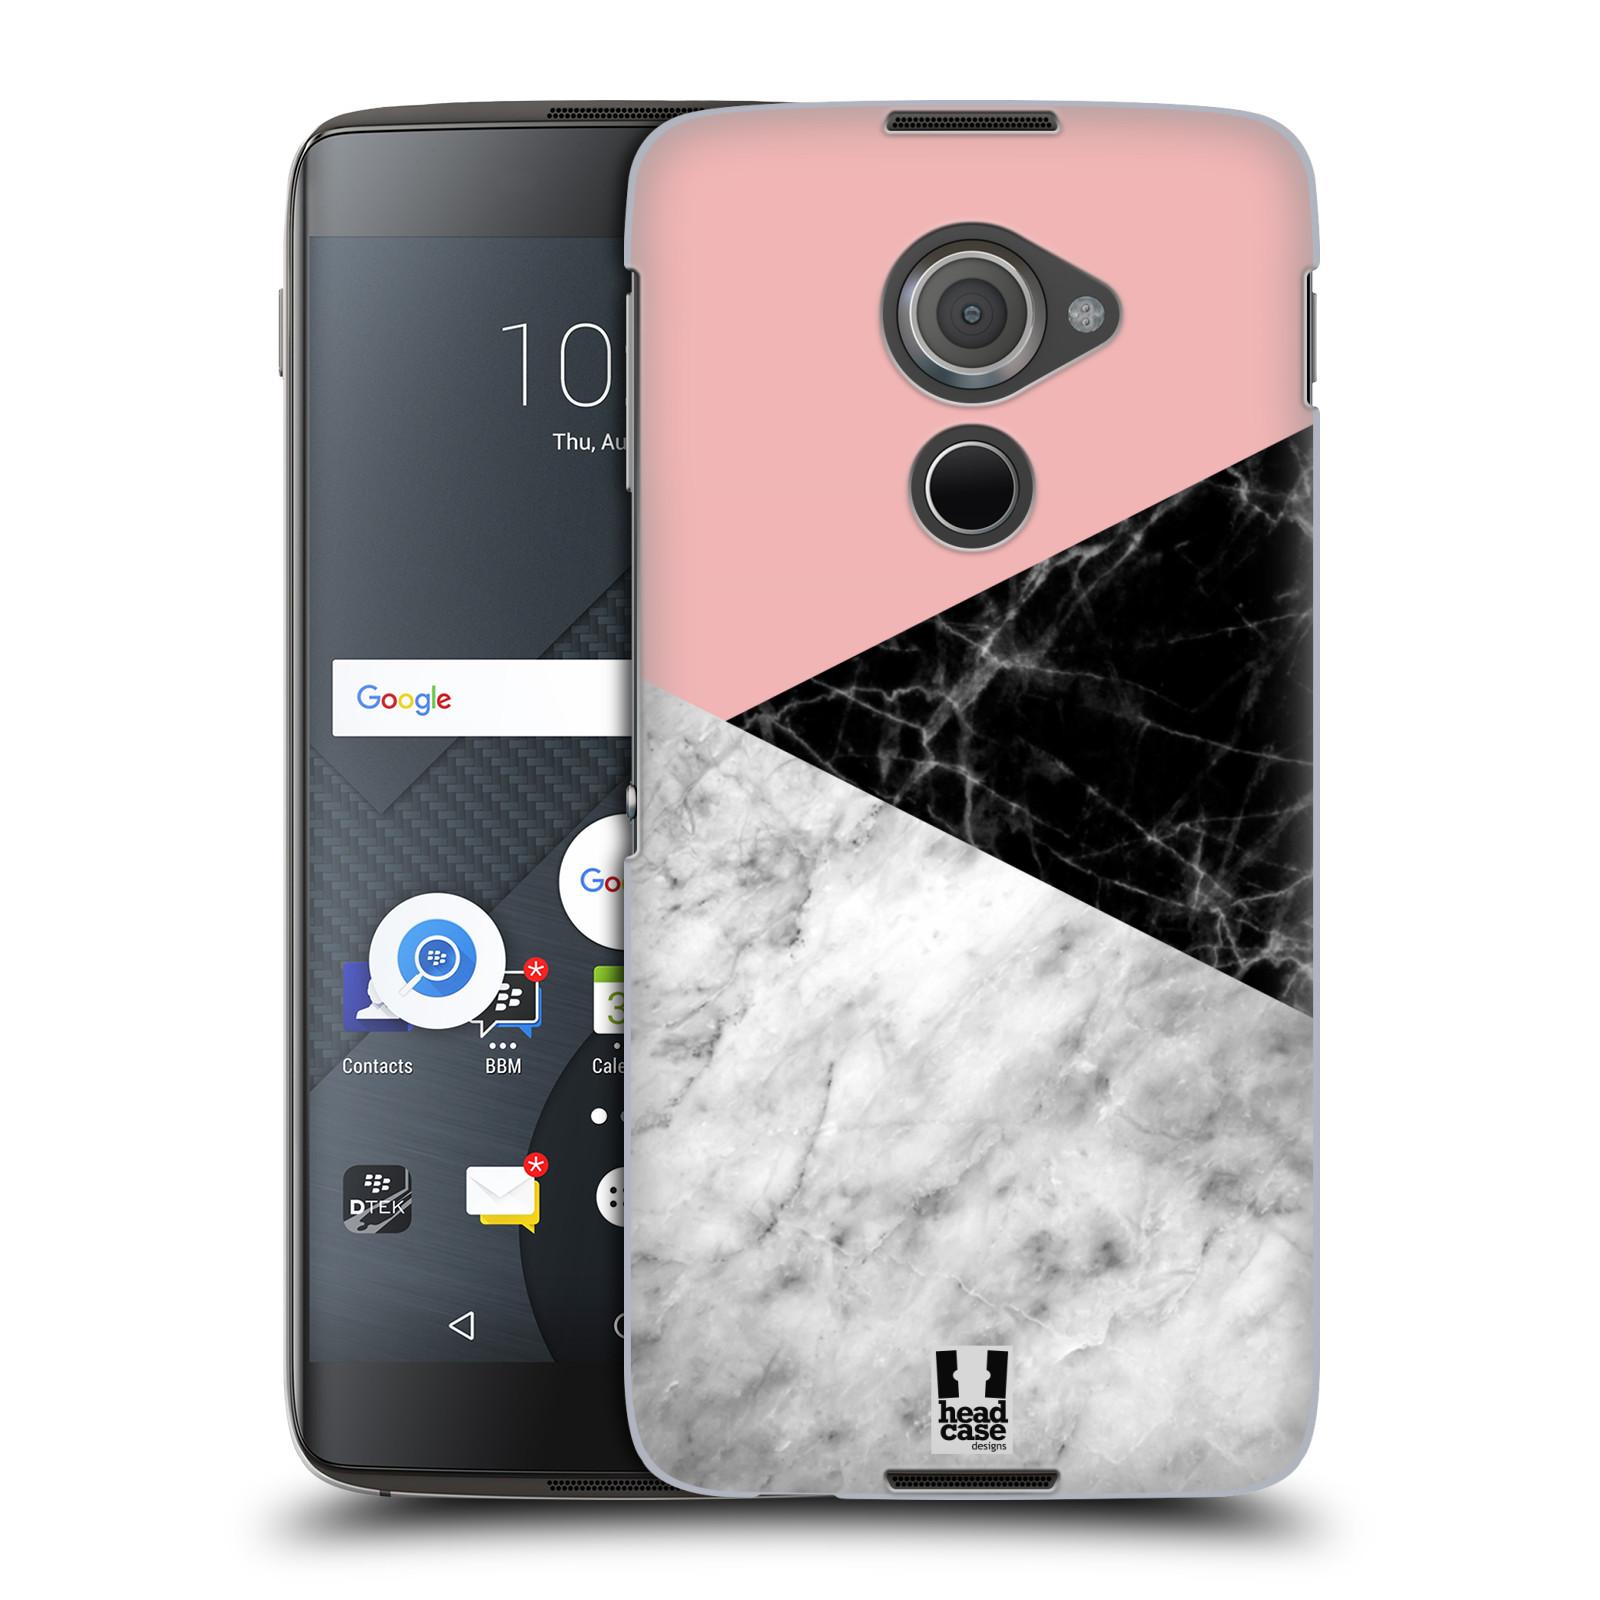 Plastové pouzdro na mobil Blackberry DTEK60 (Argon) - Head Case - Mramor mix